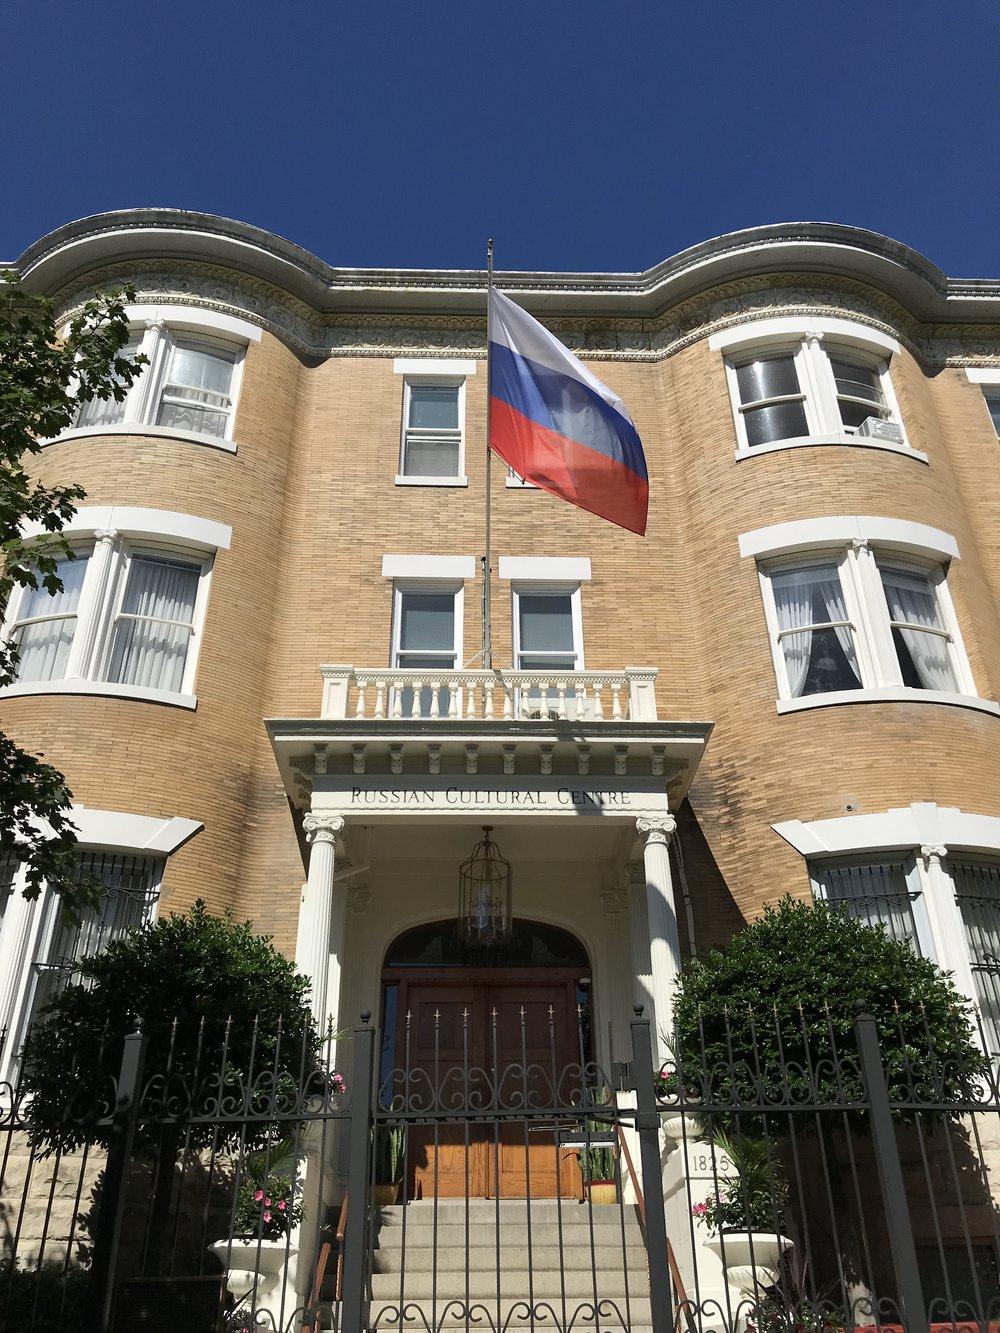 The Russian Cultural Centre.